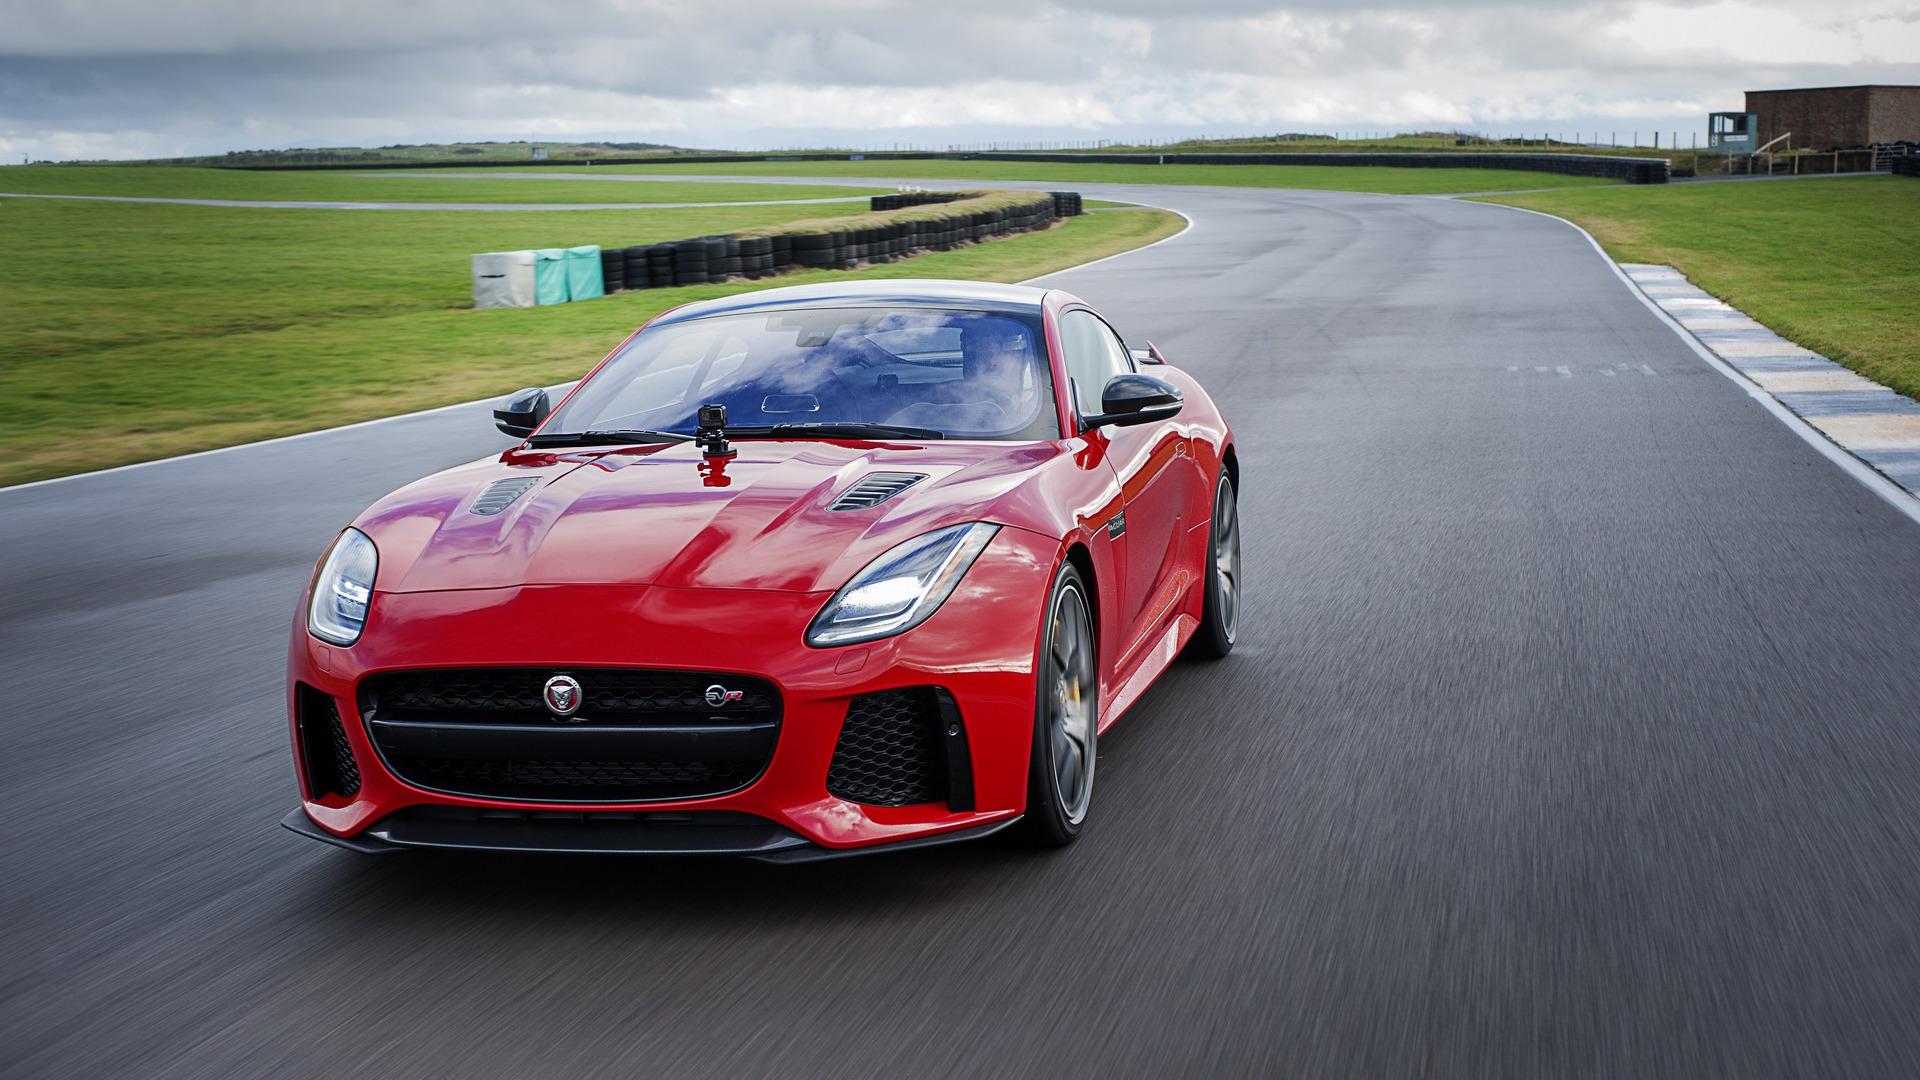 2018 Jaguar F Type Debuts 400 Sport Launch Edition Gopro Integration